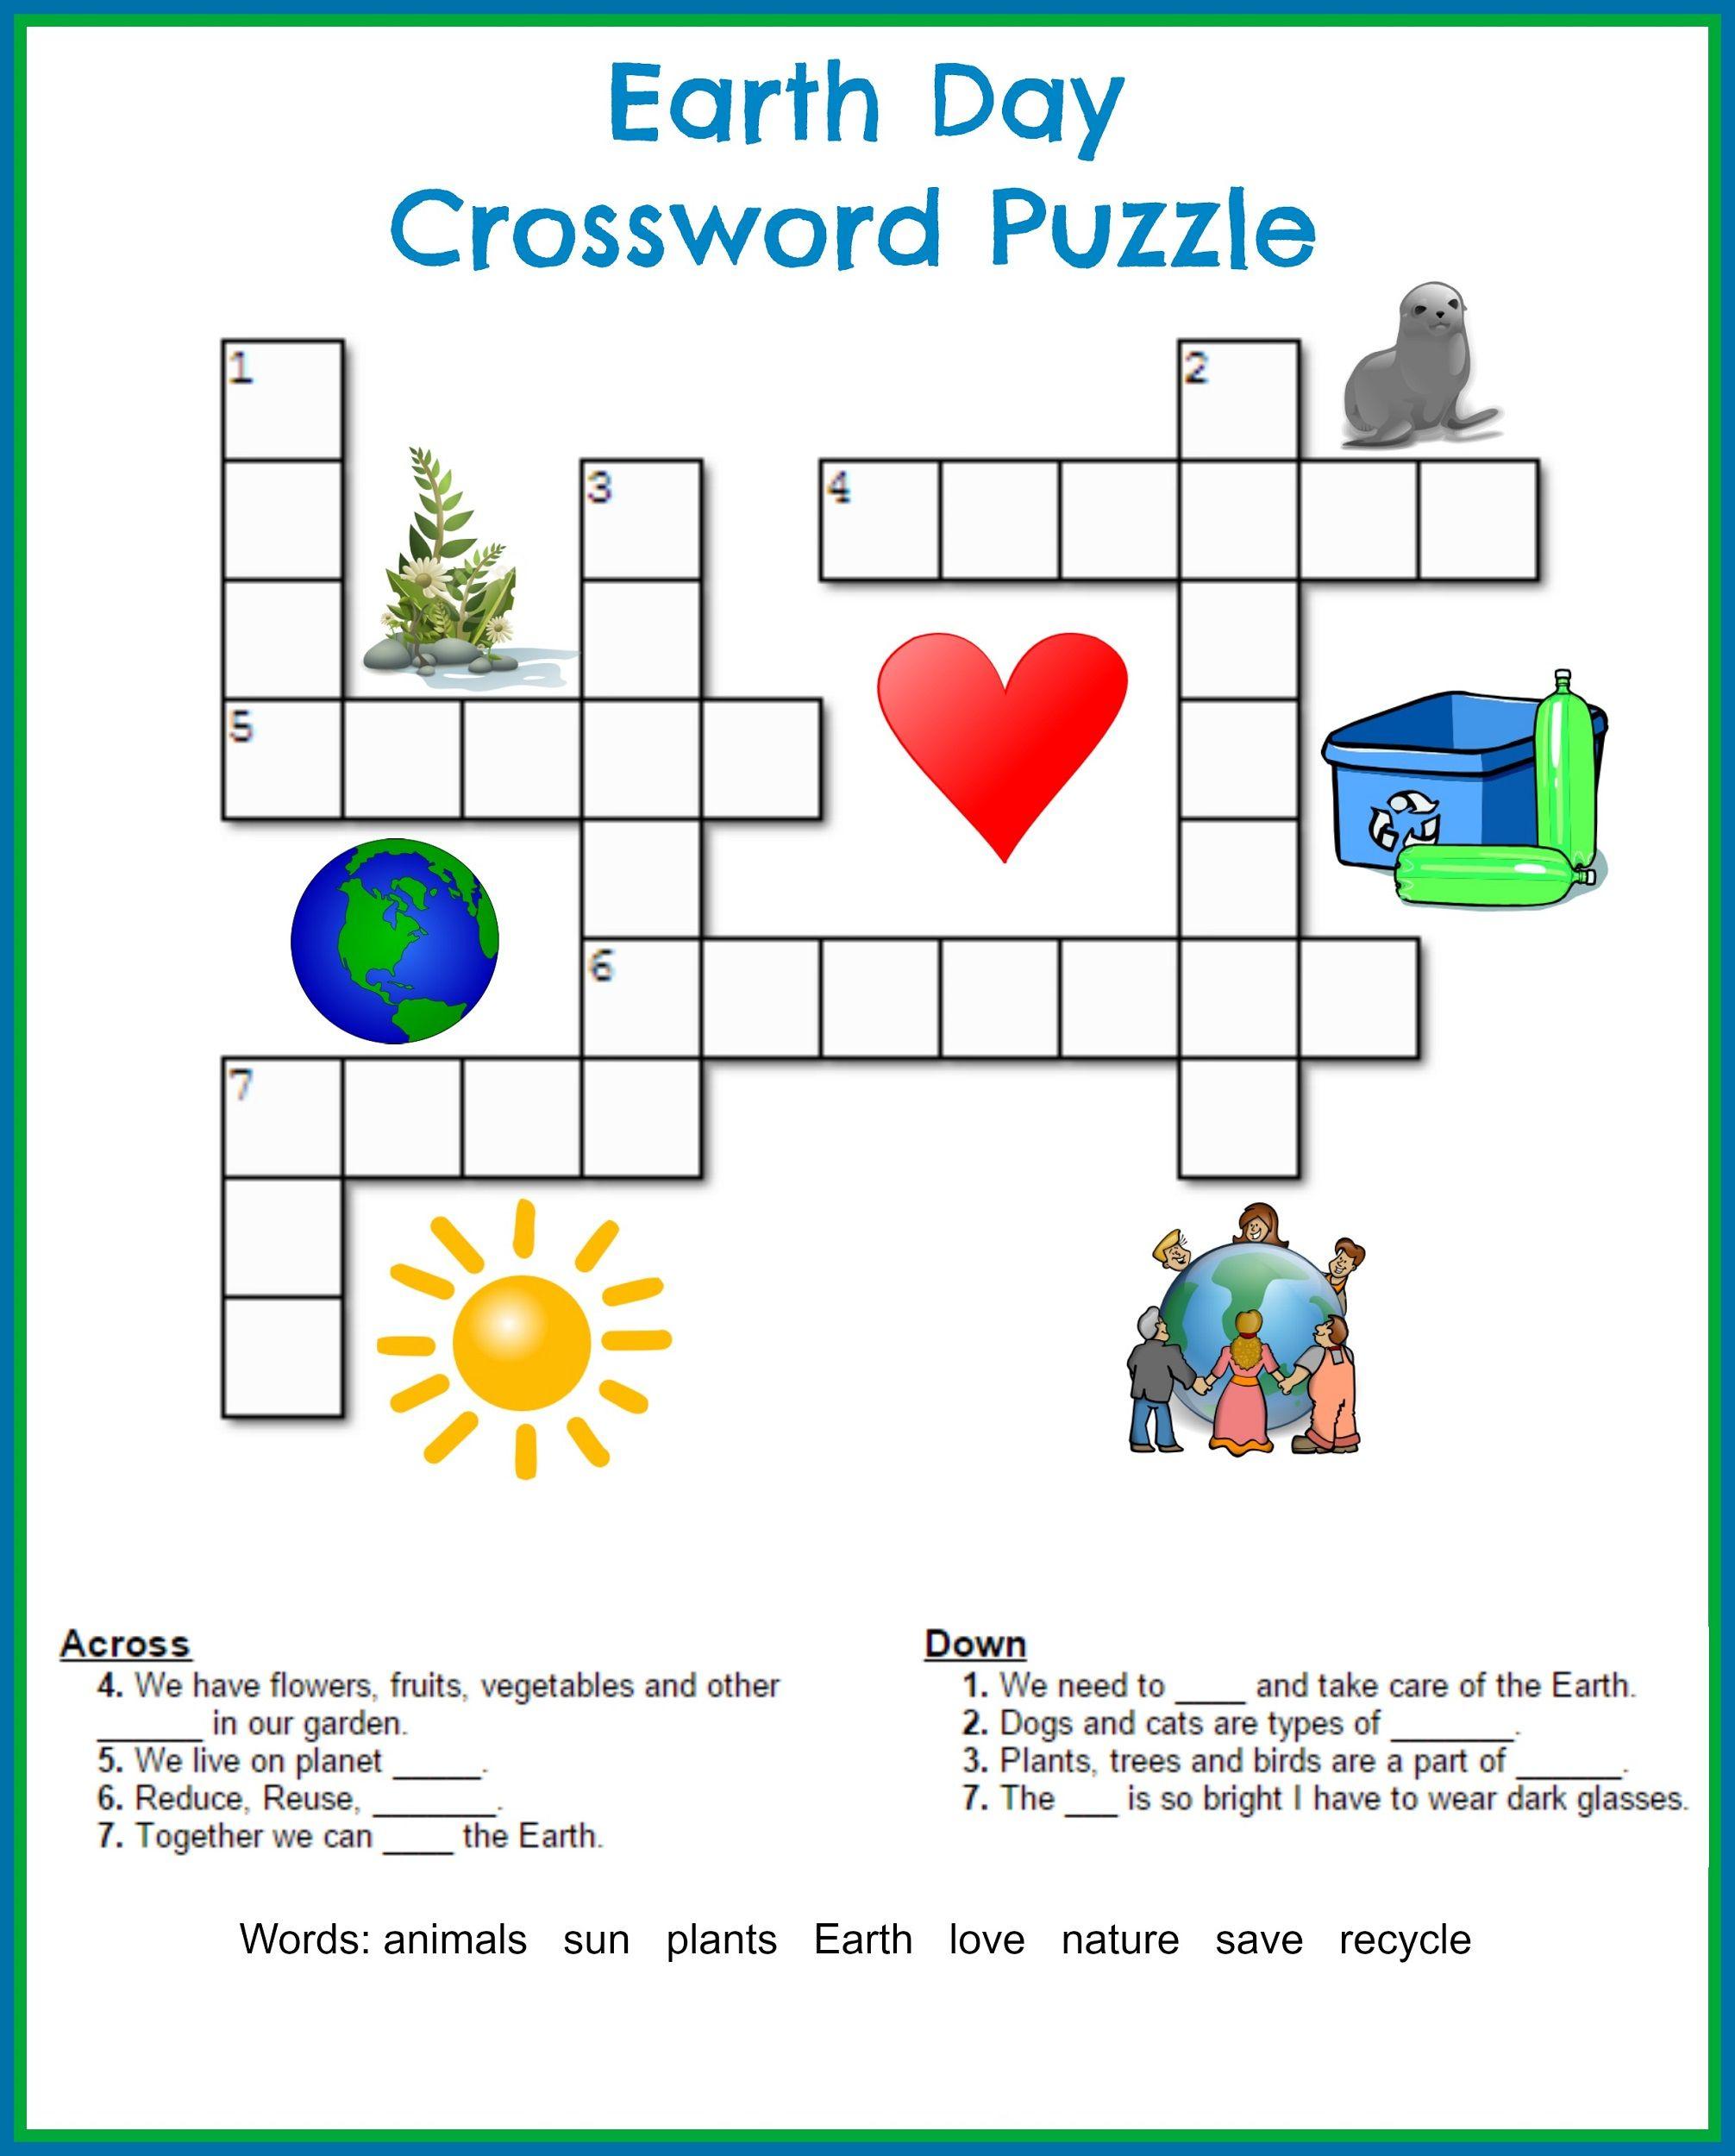 Printable Crossword Puzzles Kids | Crossword Puzzles On Earth - First Grade Crossword Puzzles Printable